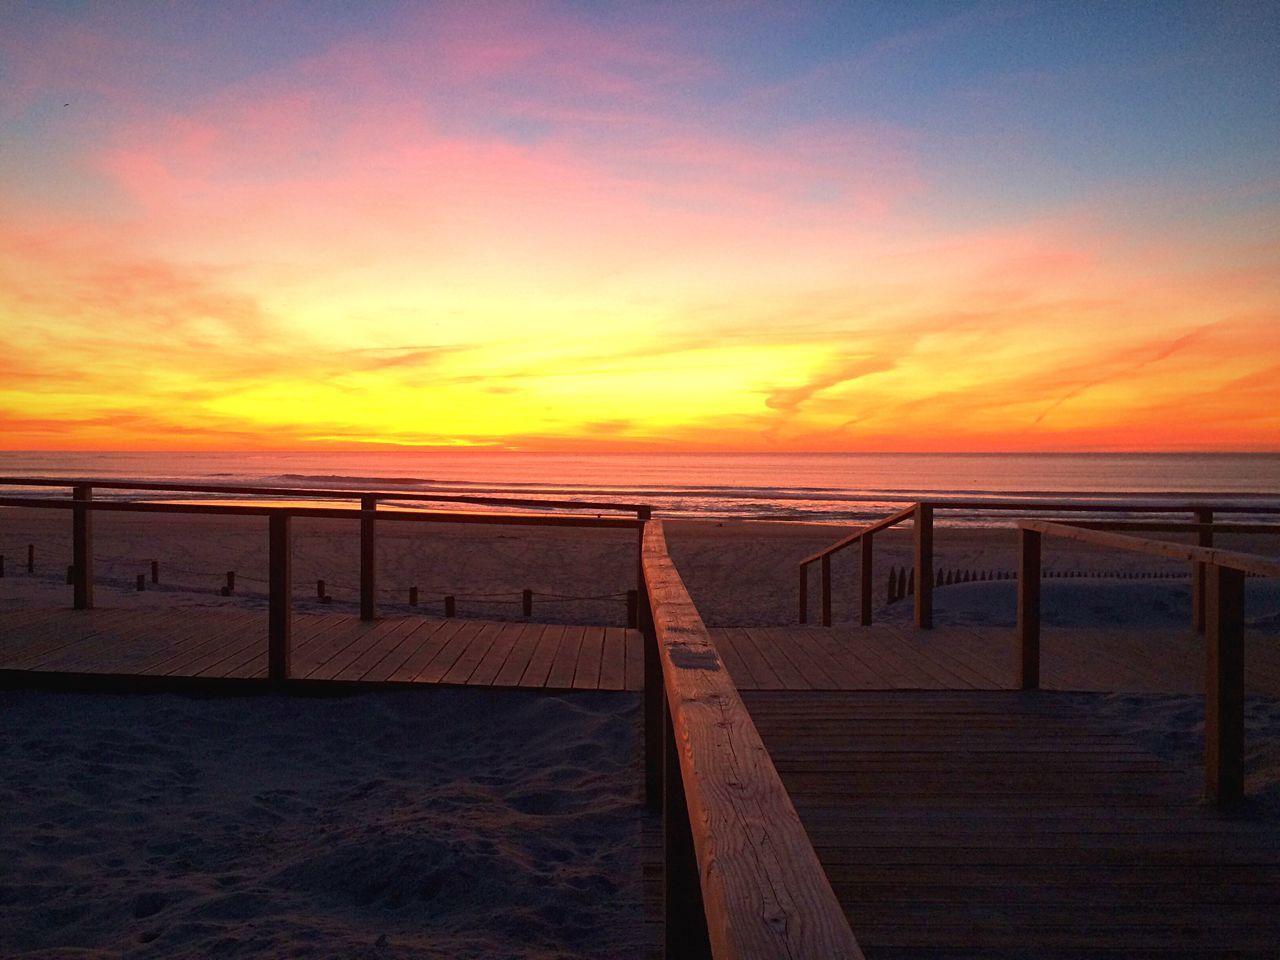 Bloody sky Sunset Aveiro Aftersurf Beachphotography Beach Sky Bloodysky RedSky Beautiful Sky